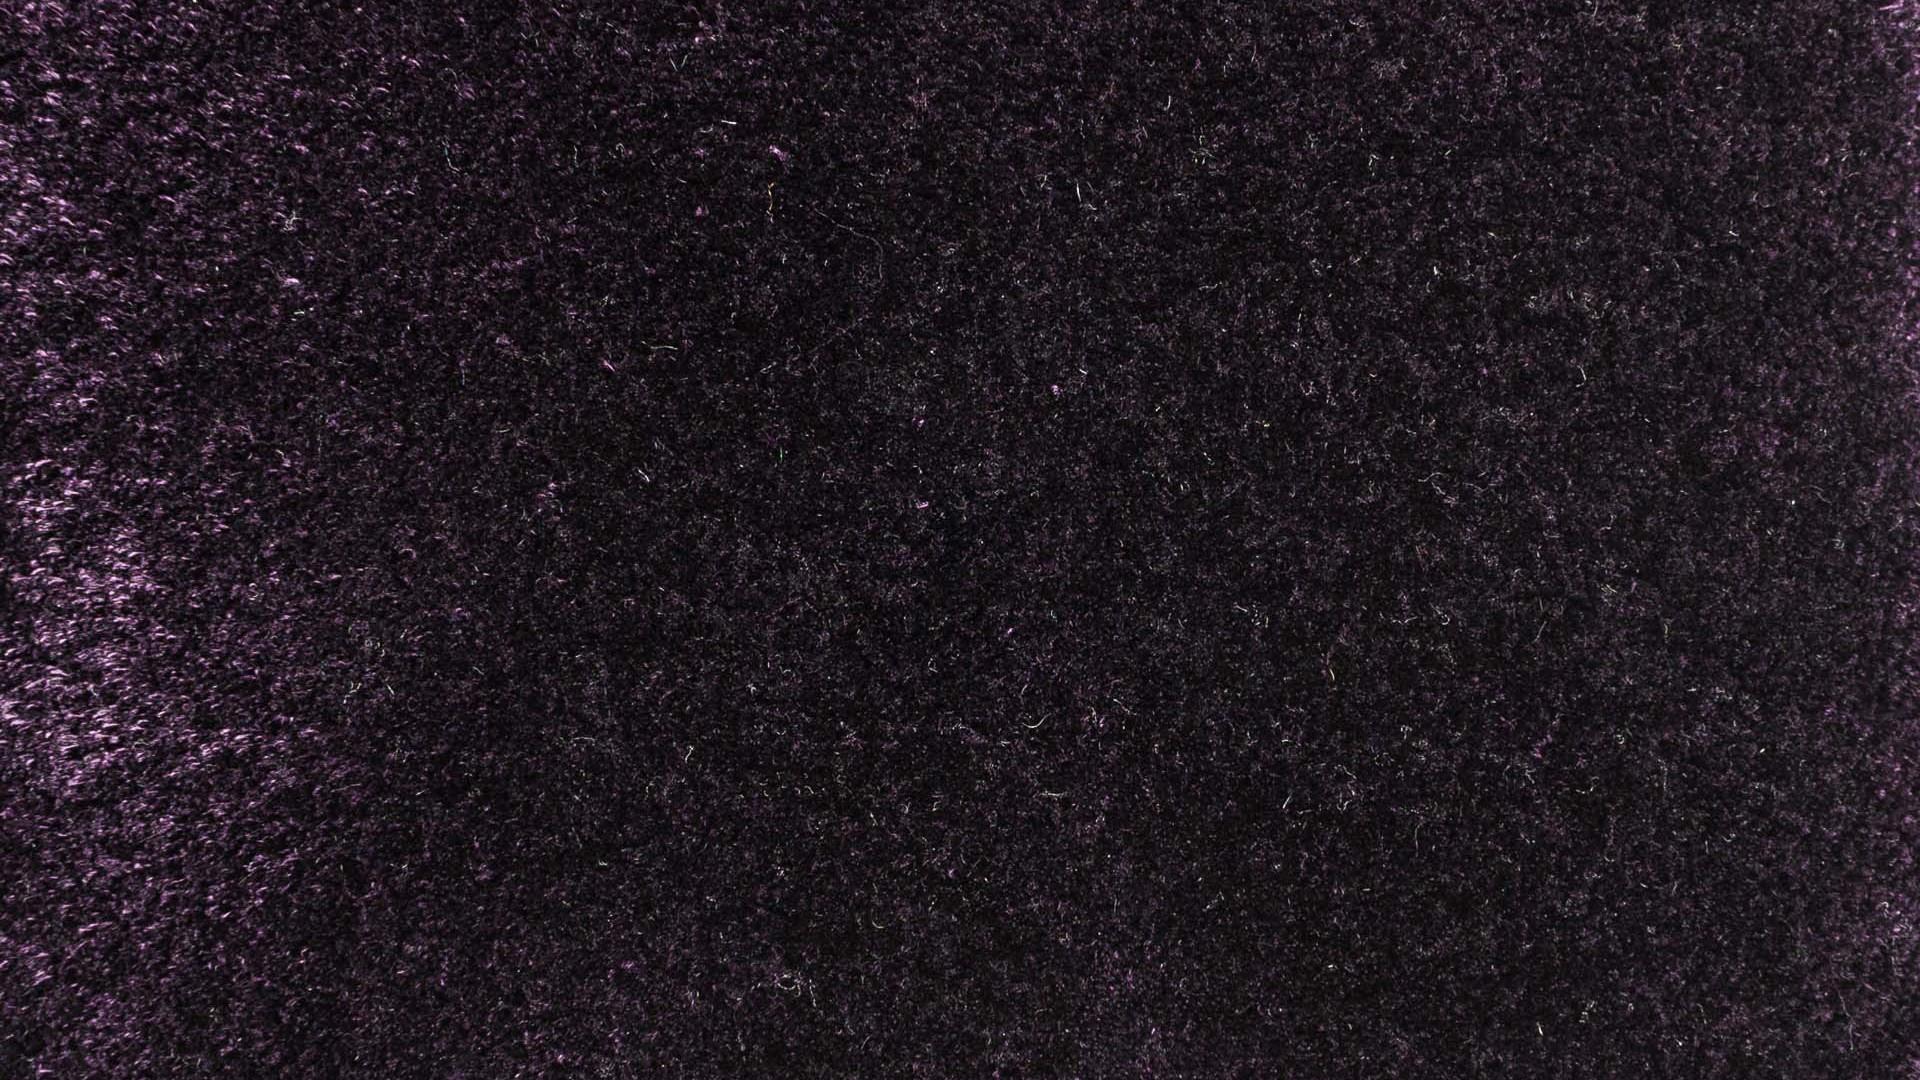 miami-dm-12-18mm.jpg